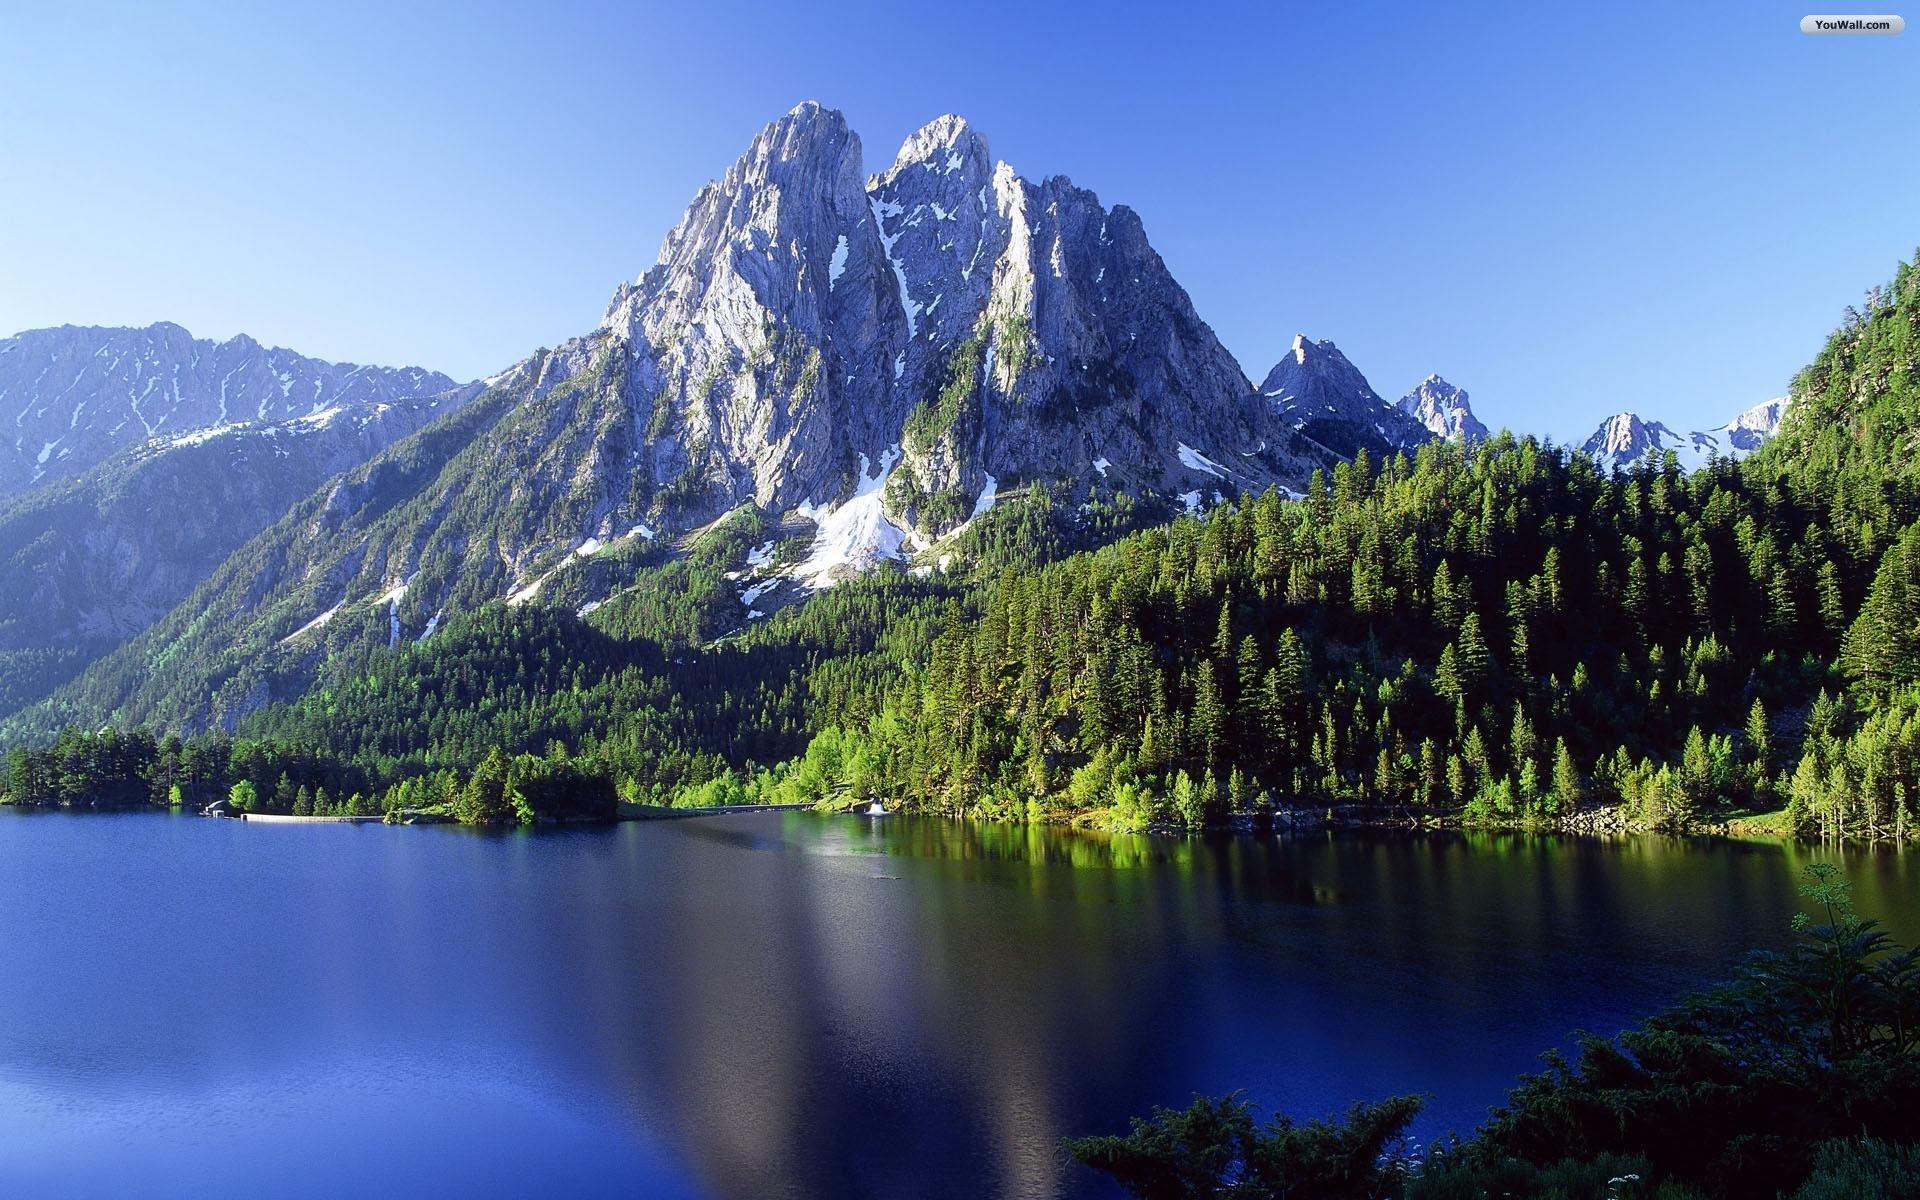 Great Wallpaper Mountain Google - Mountain-Image-Wallpapers-052  Photograph_436569.jpg